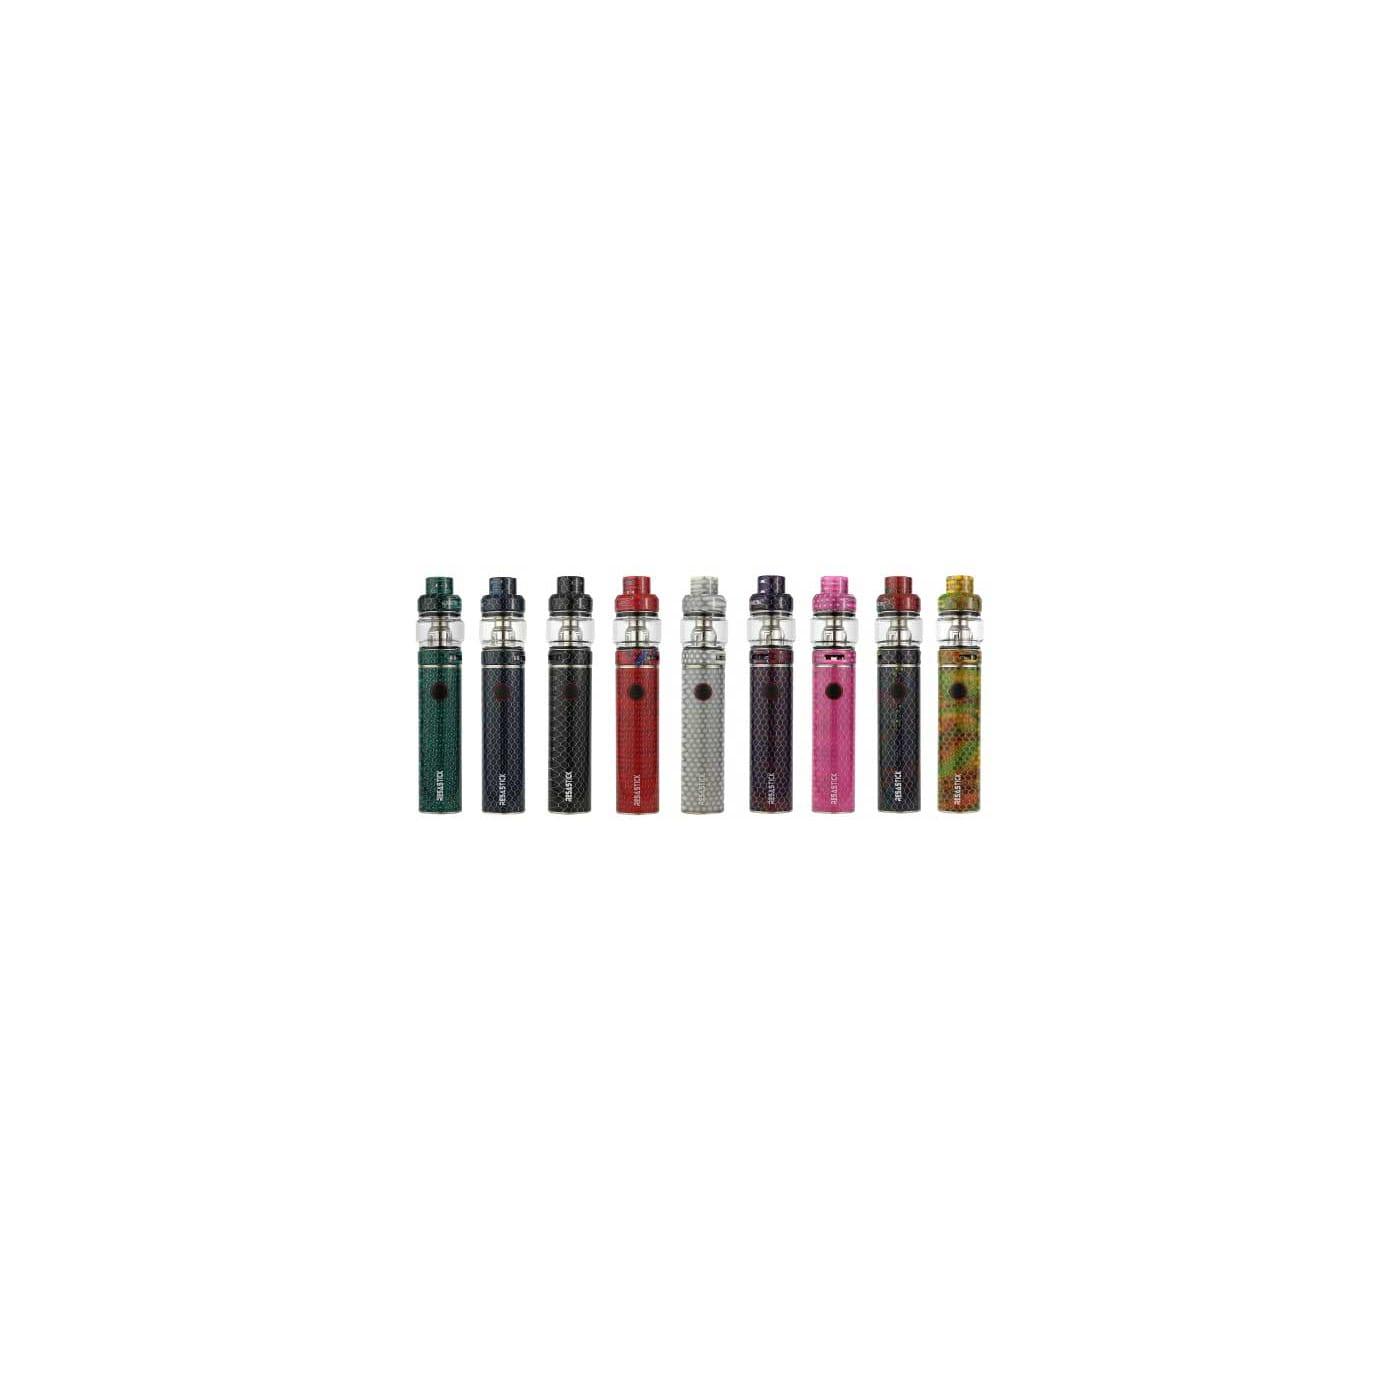 SMOK Resa Stick Colors